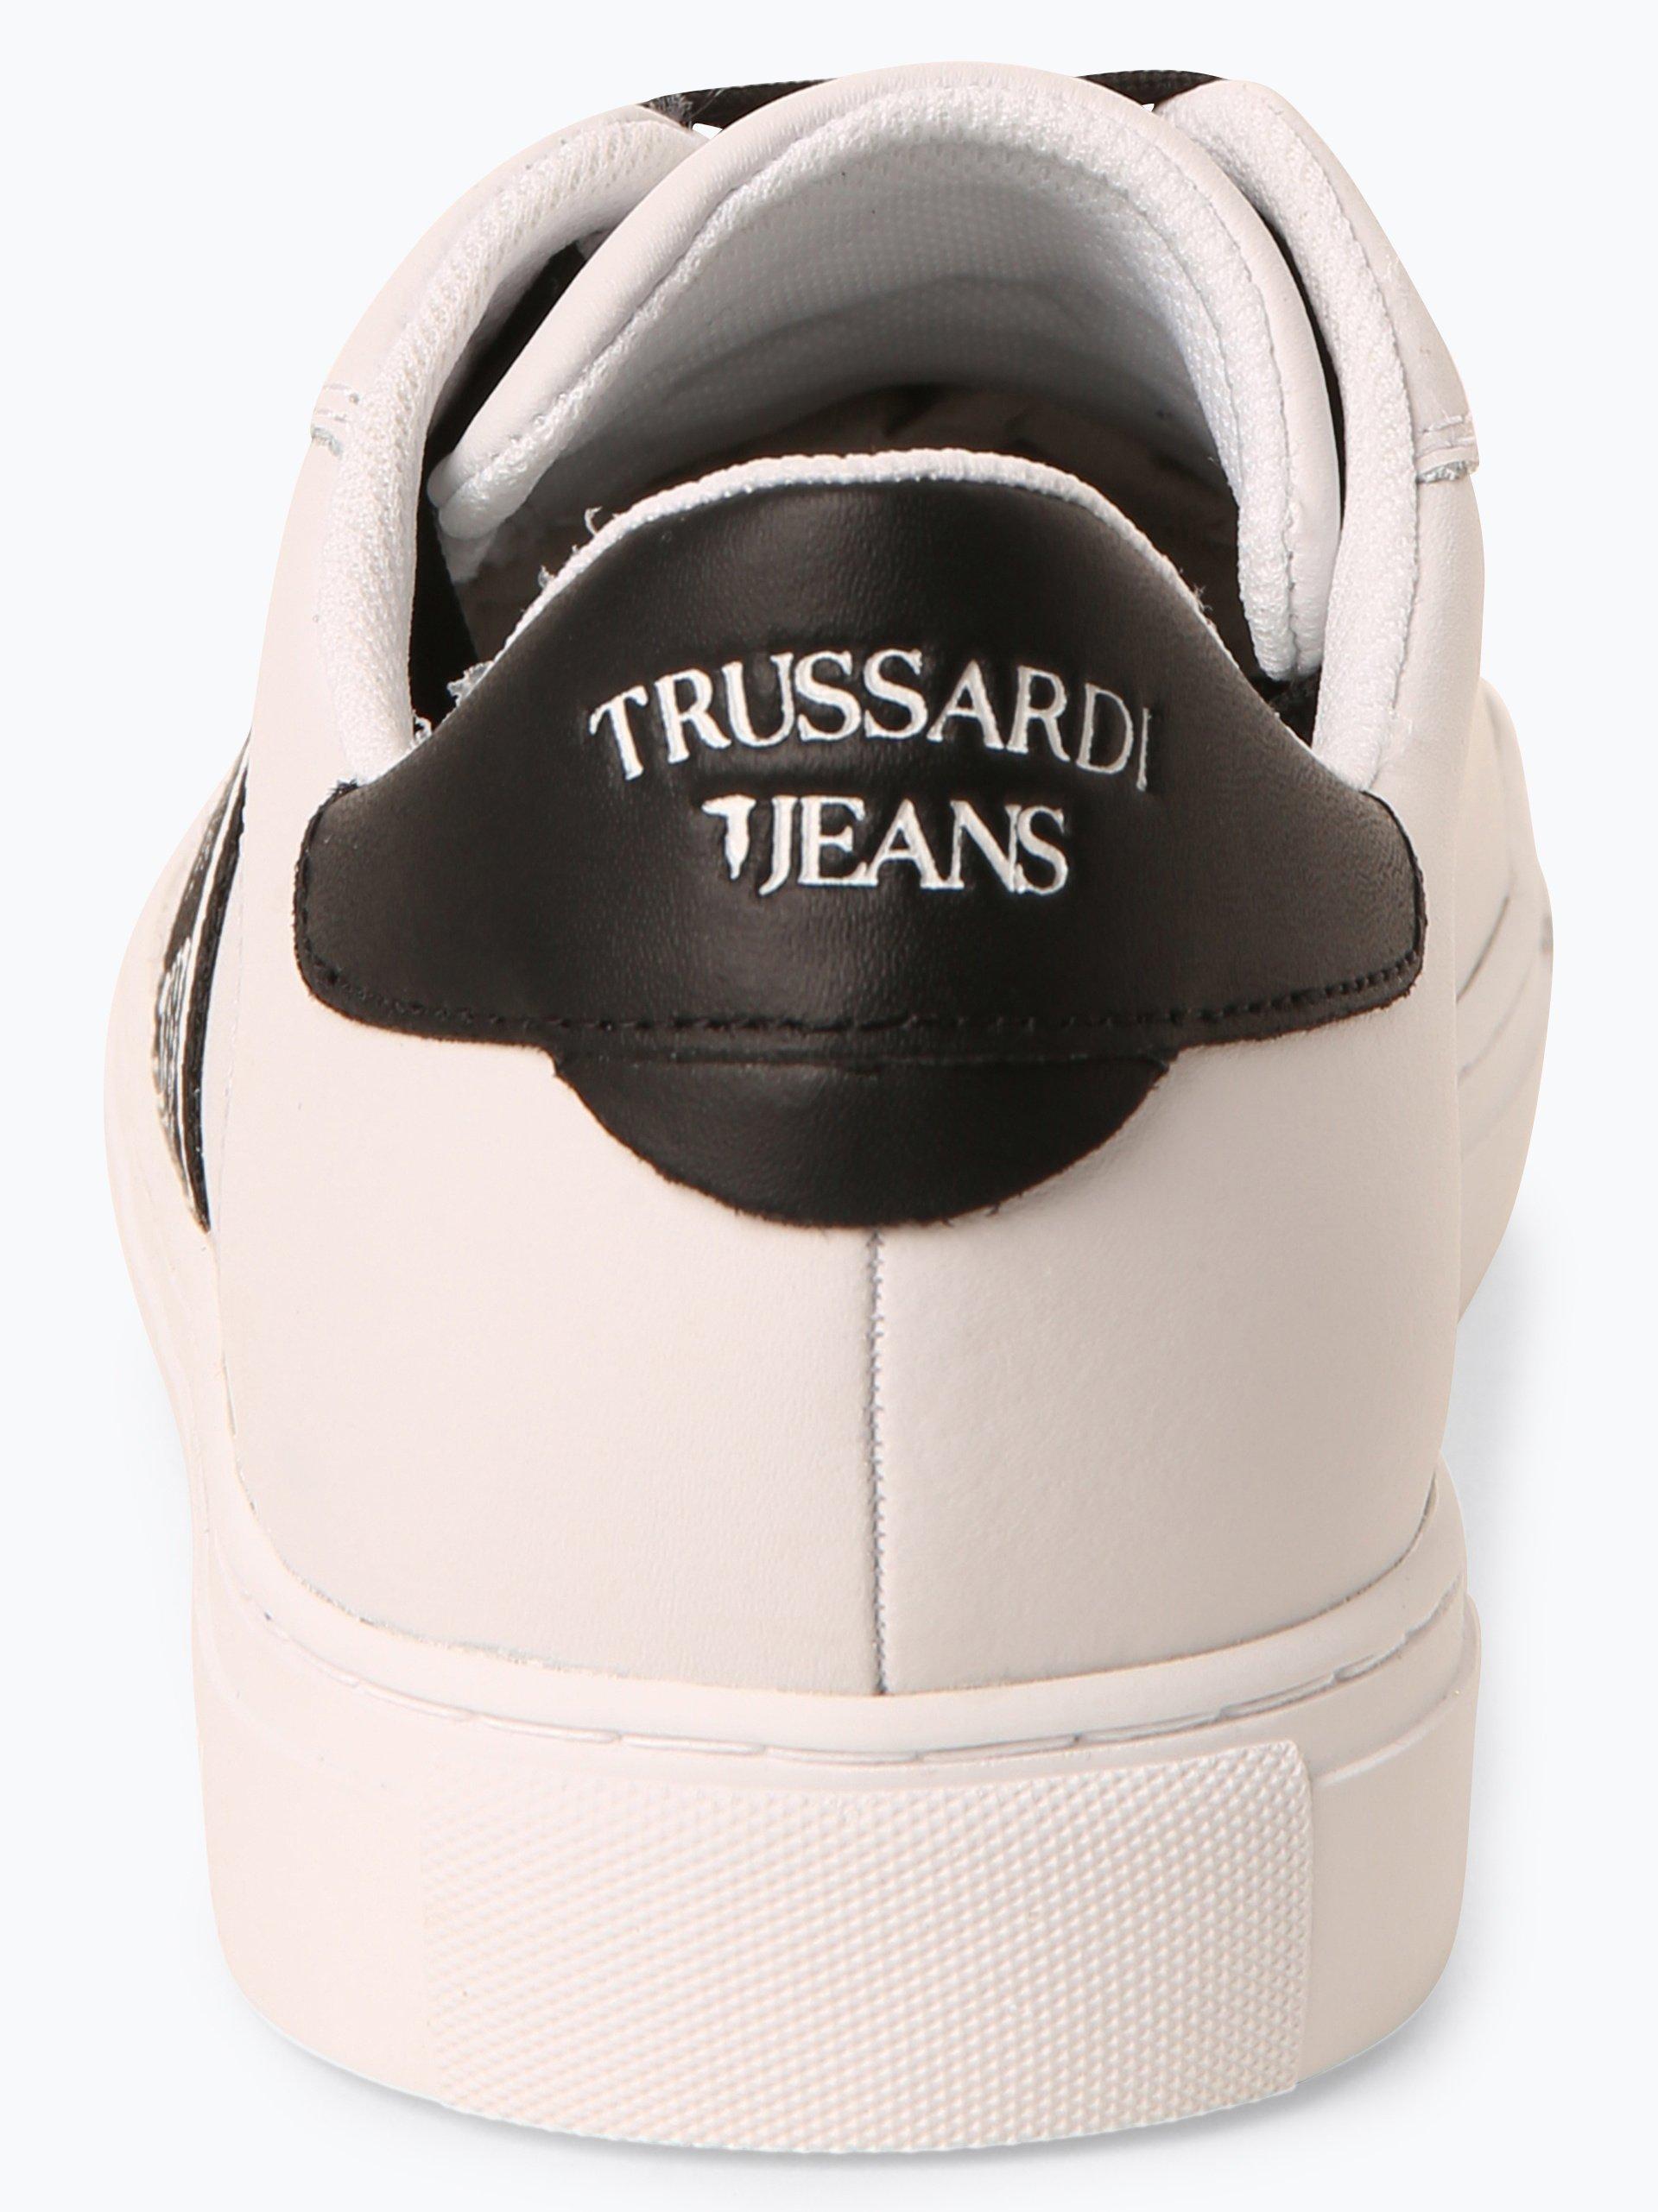 Trussadi Jeans Męskie tenisówki ze skóry